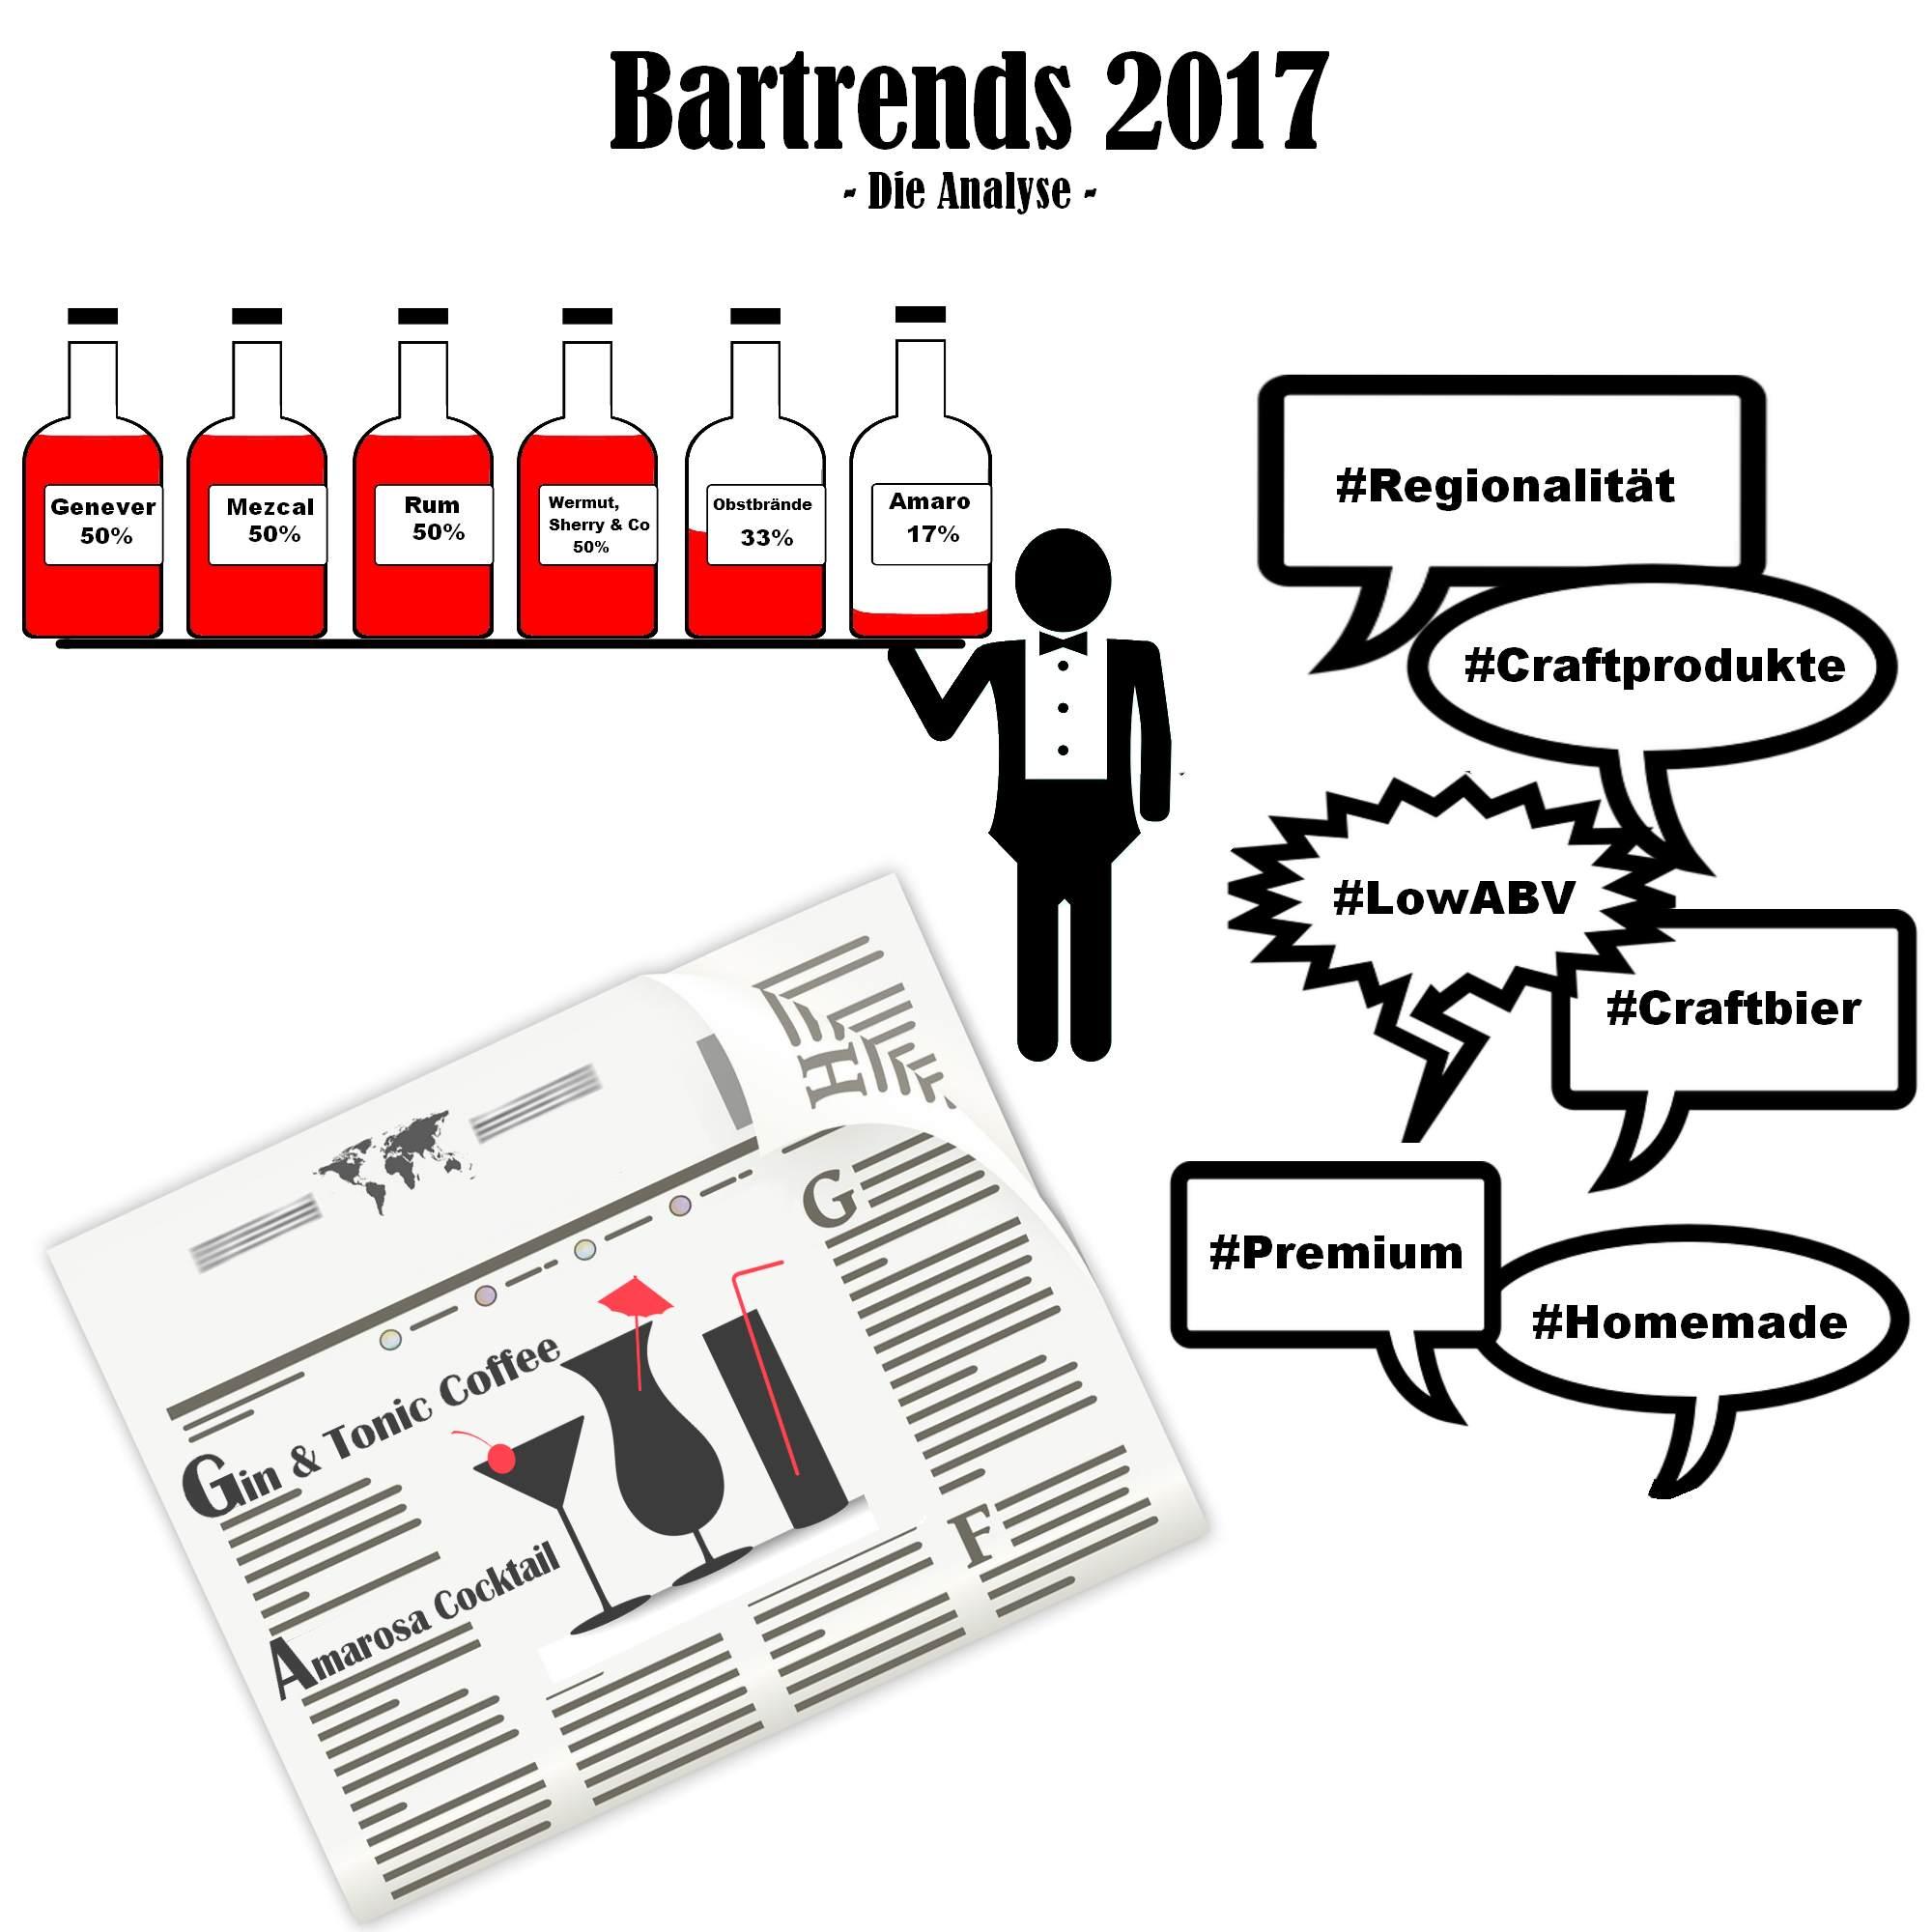 Bartrends 2017